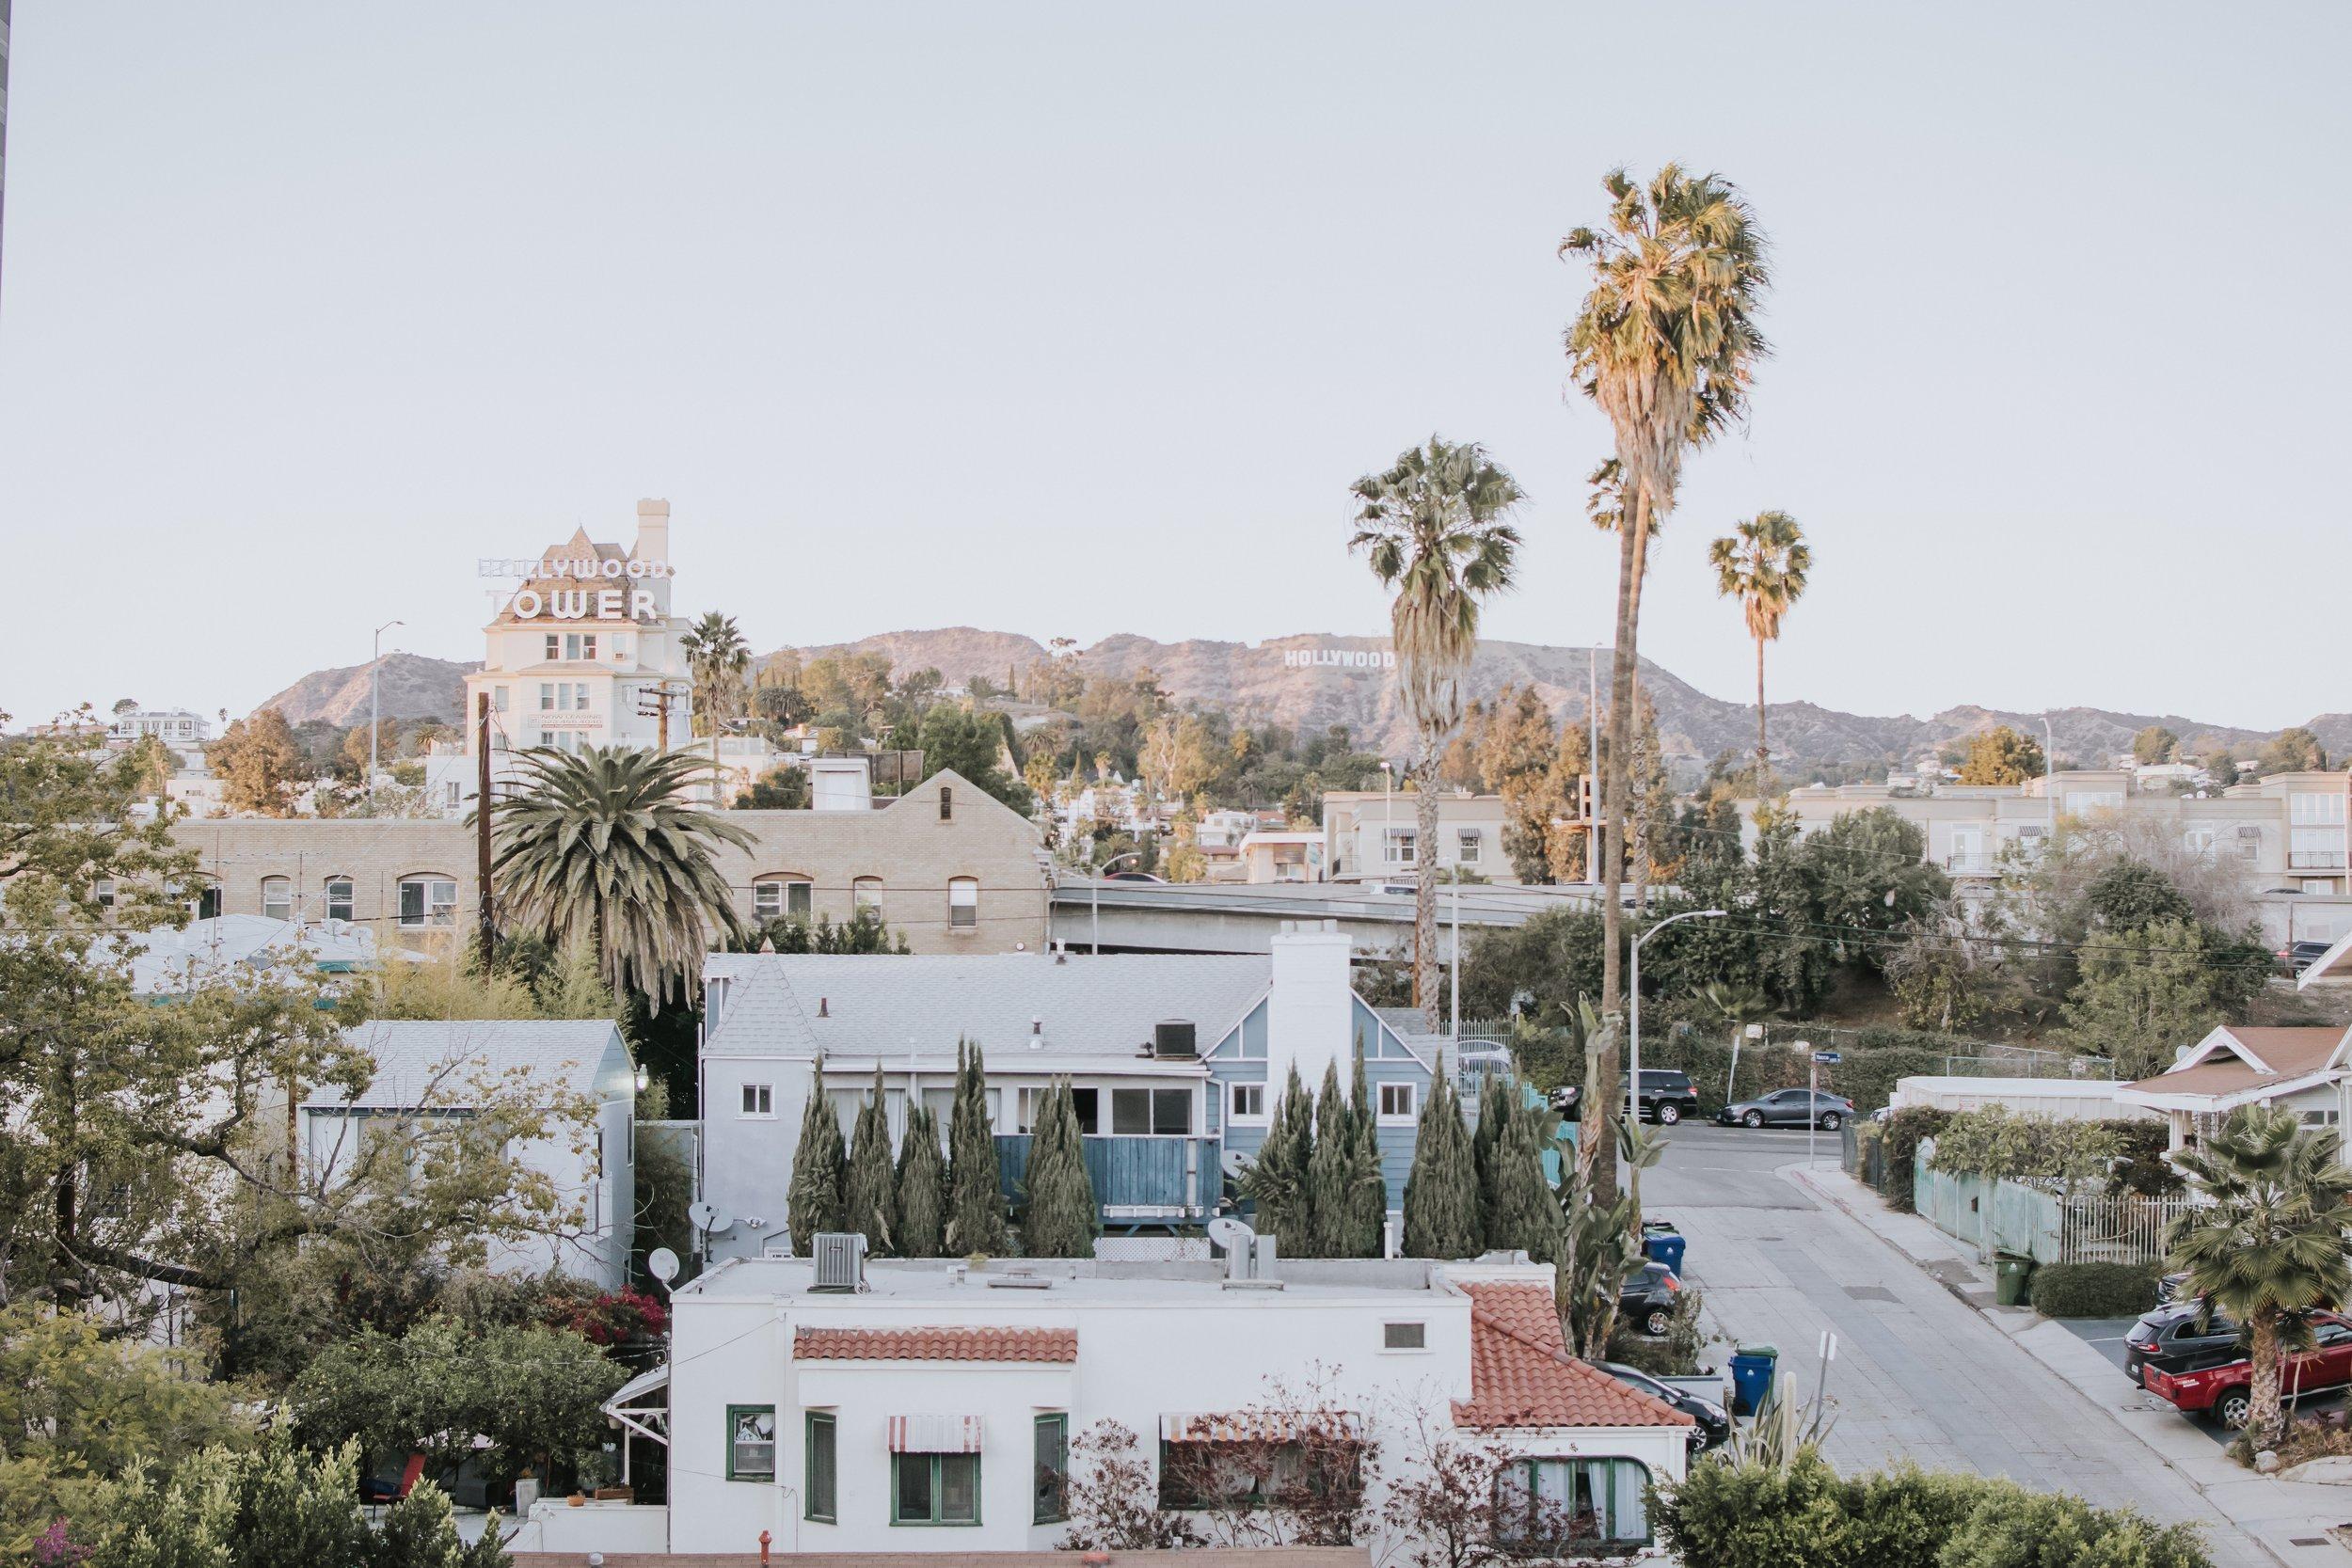 hollywood_losangeles_california.jpg